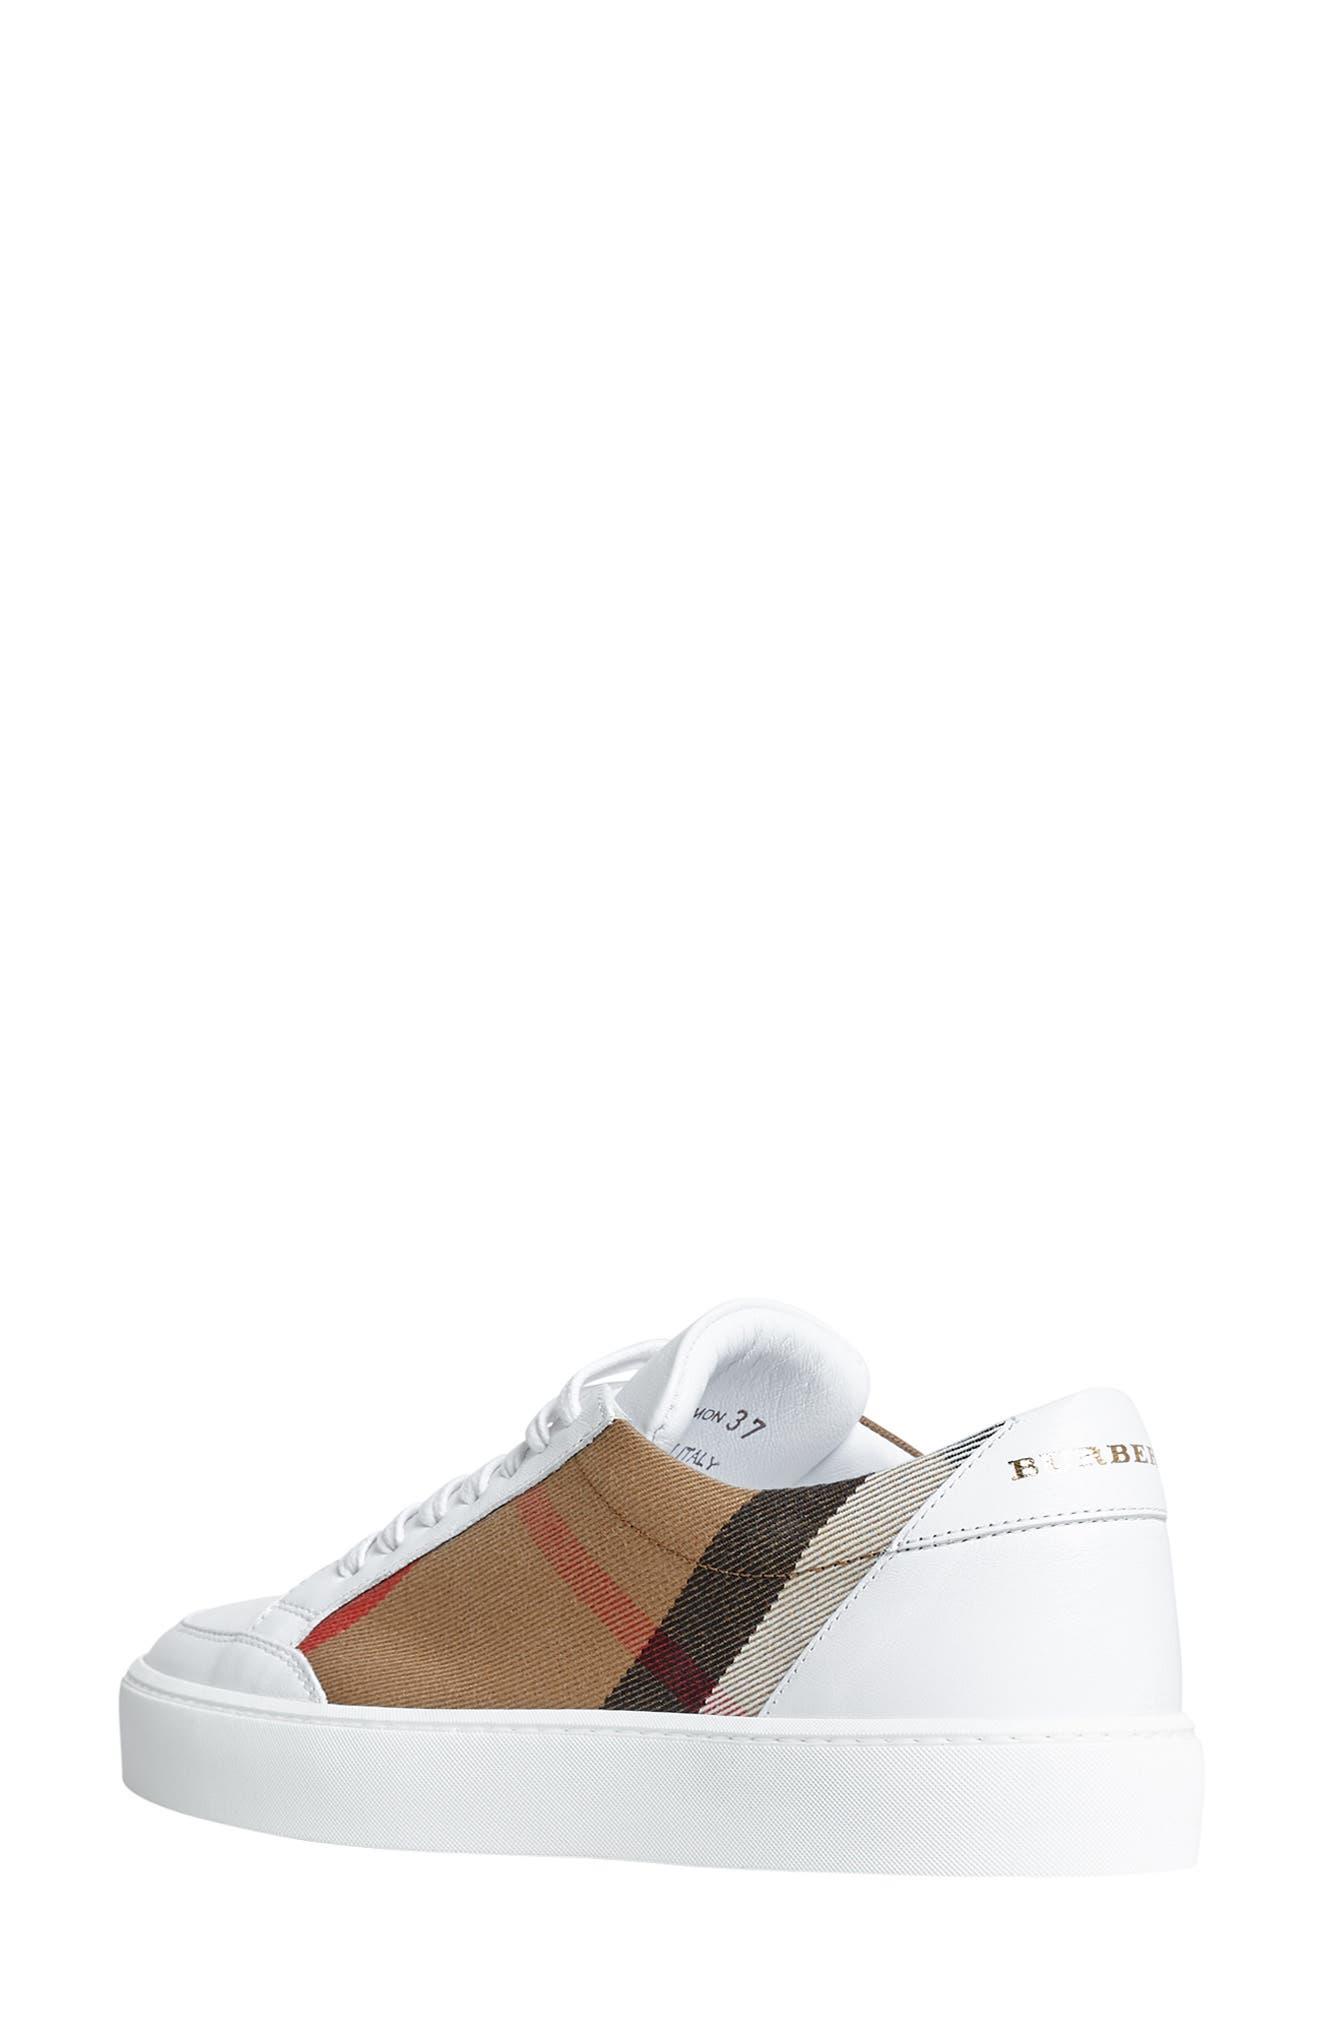 BURBERRY, Salmond Sneaker, Alternate thumbnail 2, color, WHITE